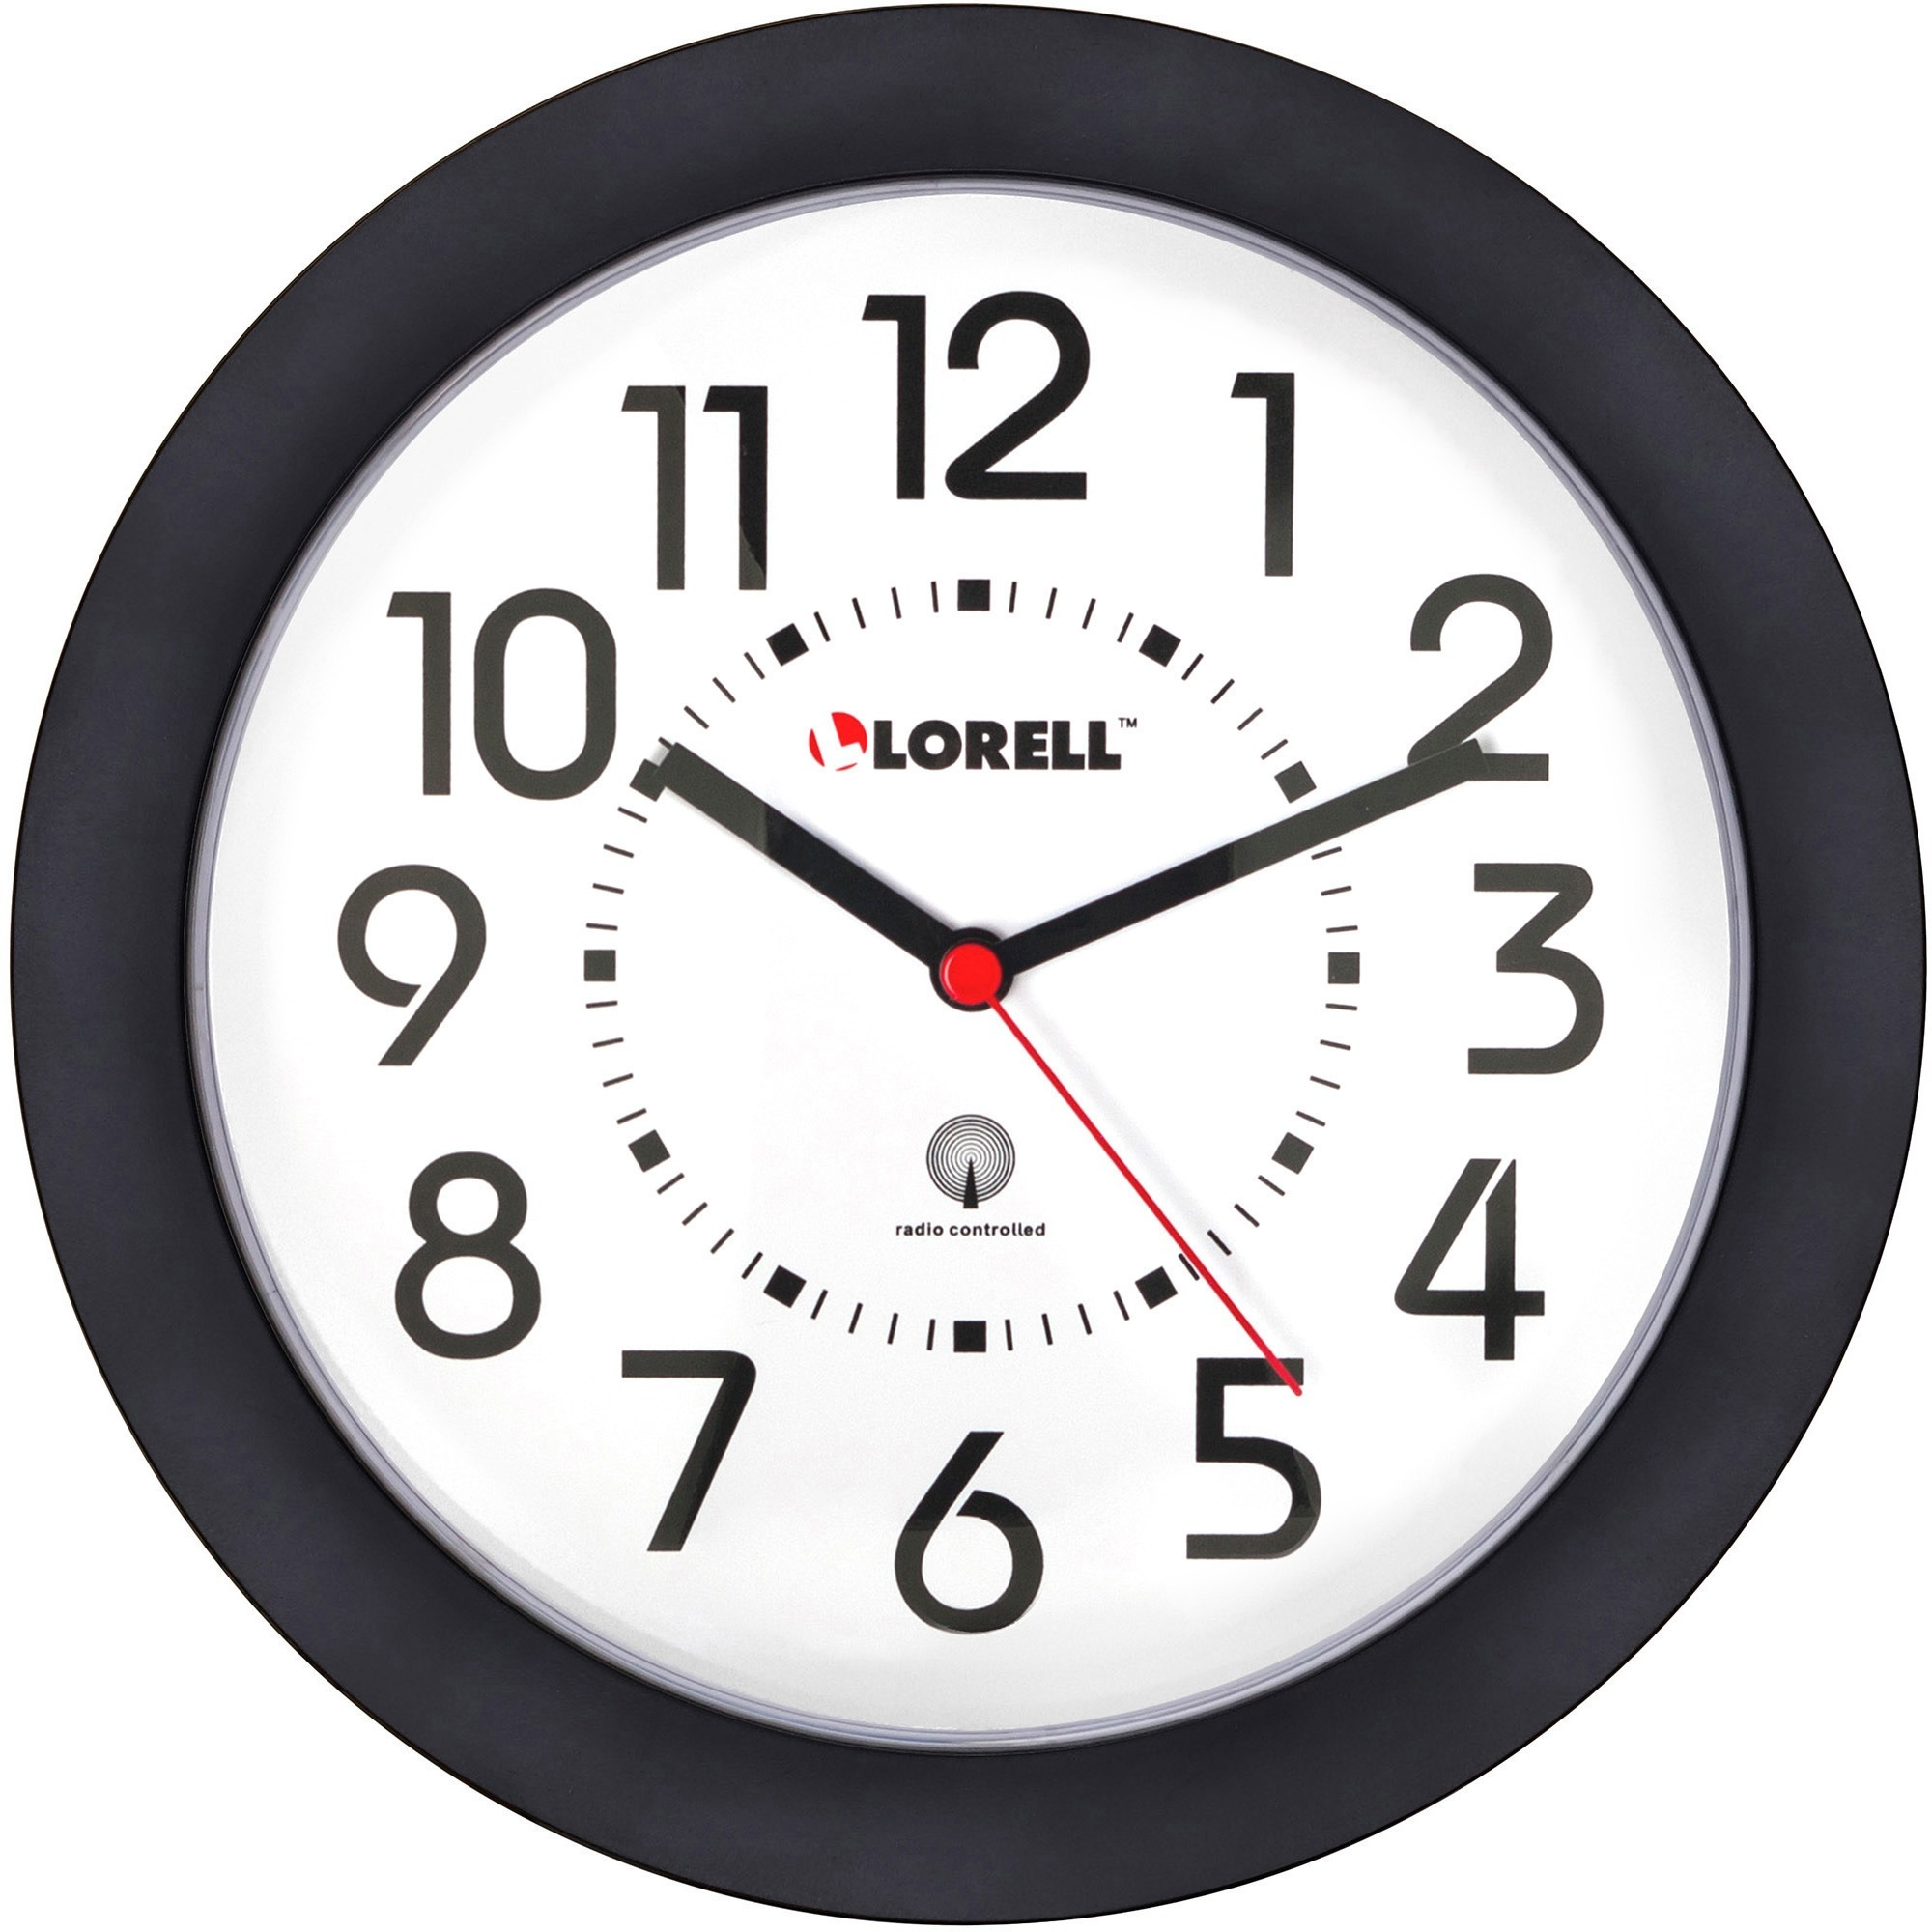 Llr 60990 Lorell 9 Quot Radio Controlled Profile Wall Clock